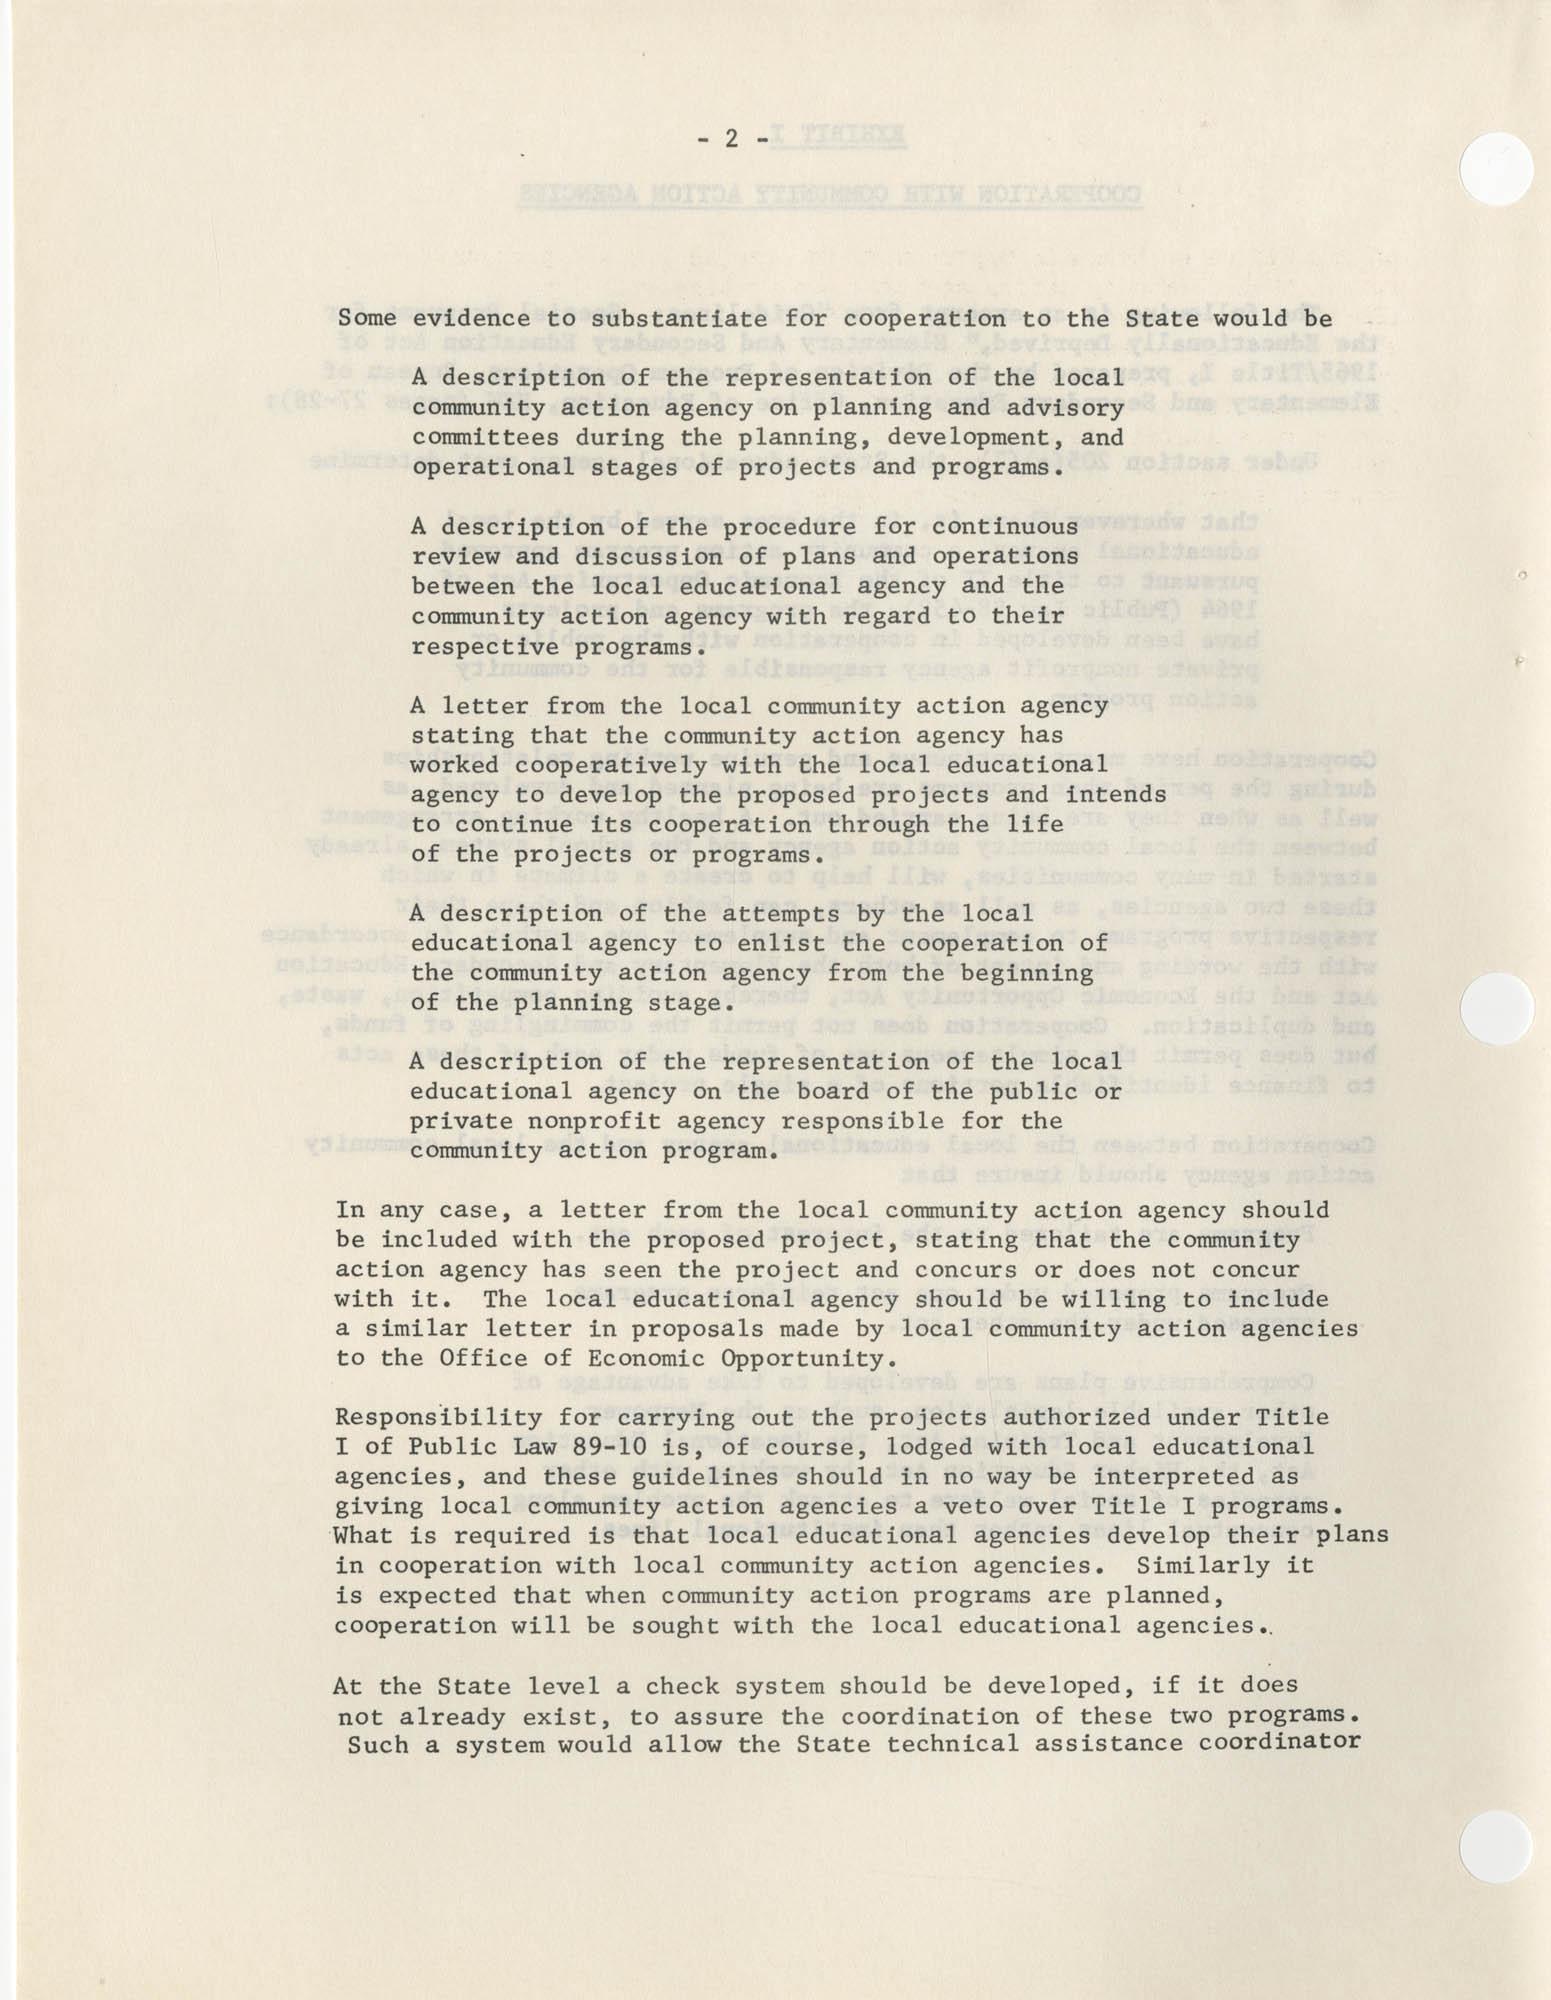 Community Action Program Memorandum No. 27, Exhibit 1 Page 2